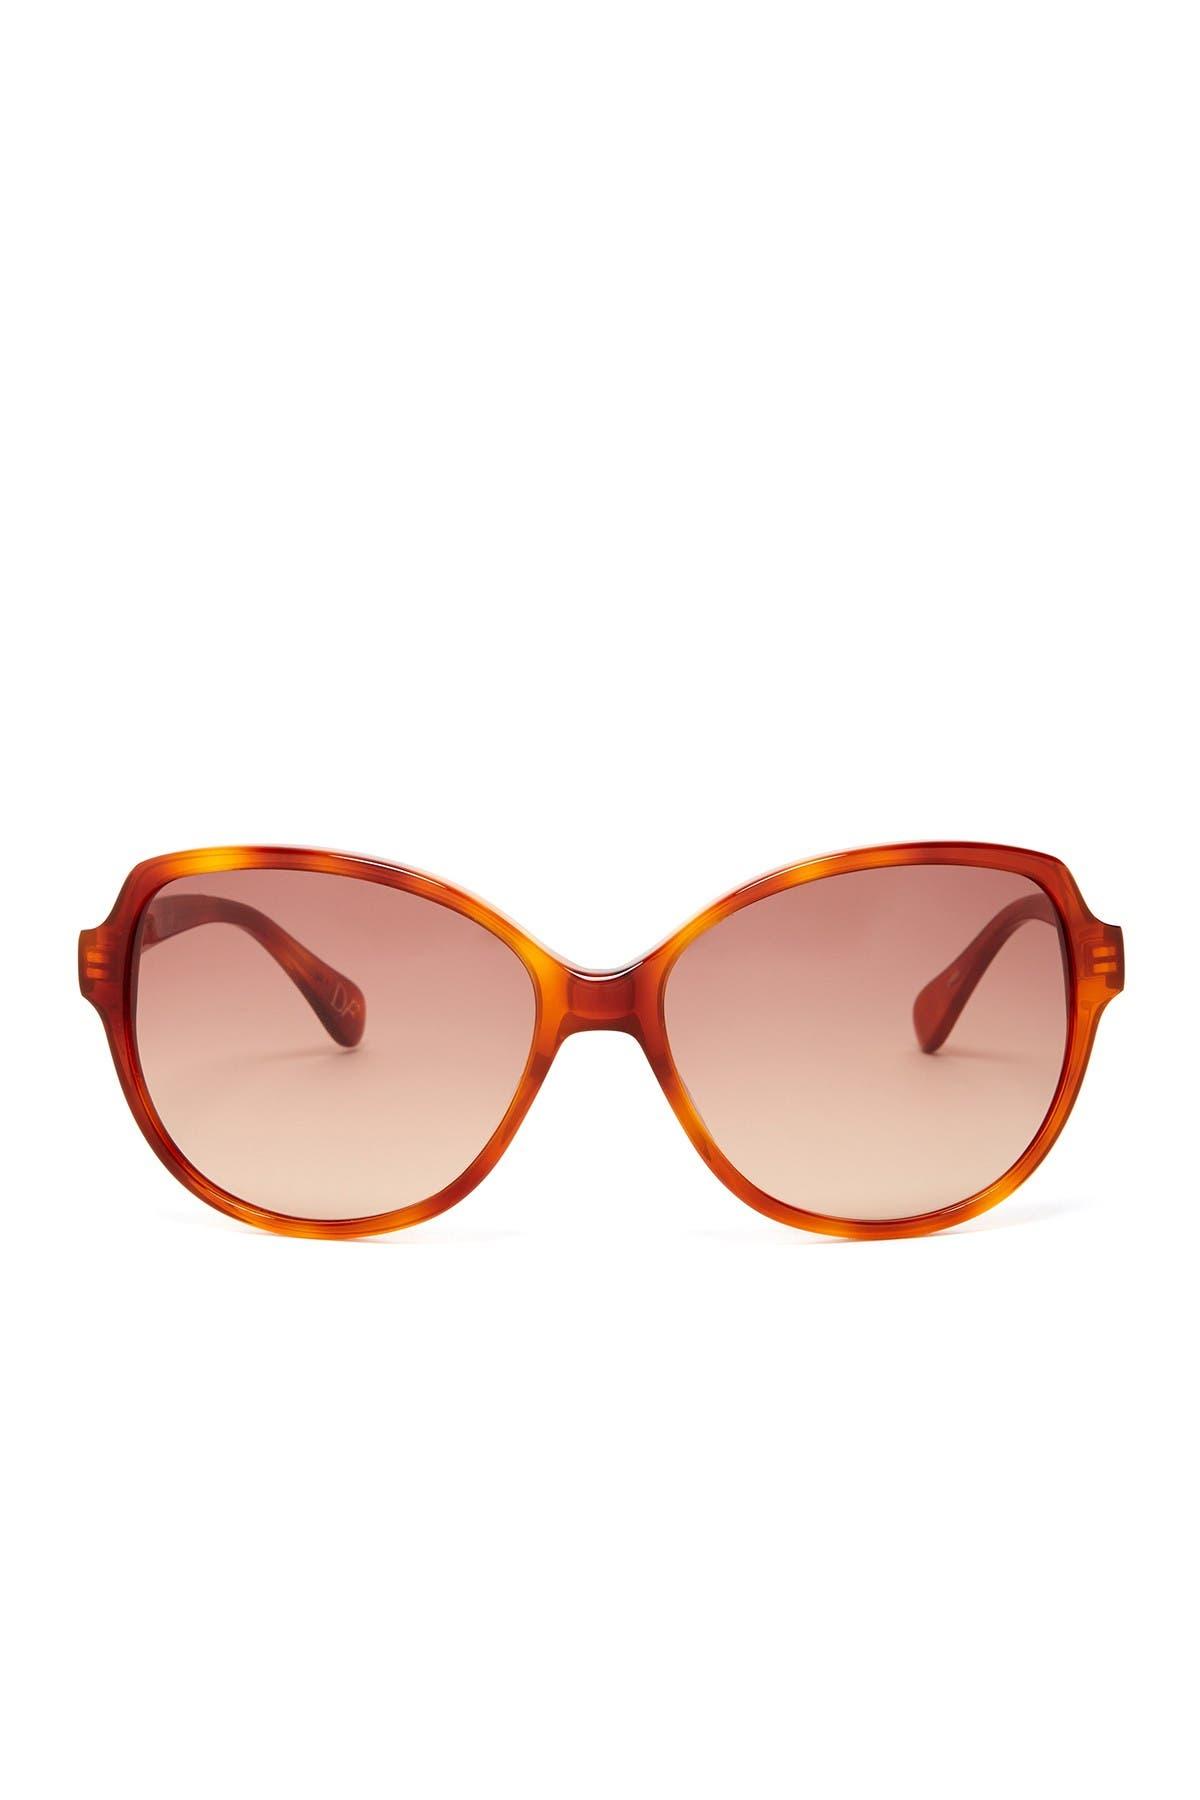 Image of Diane von Furstenberg 56mm Oversized Sunglasses